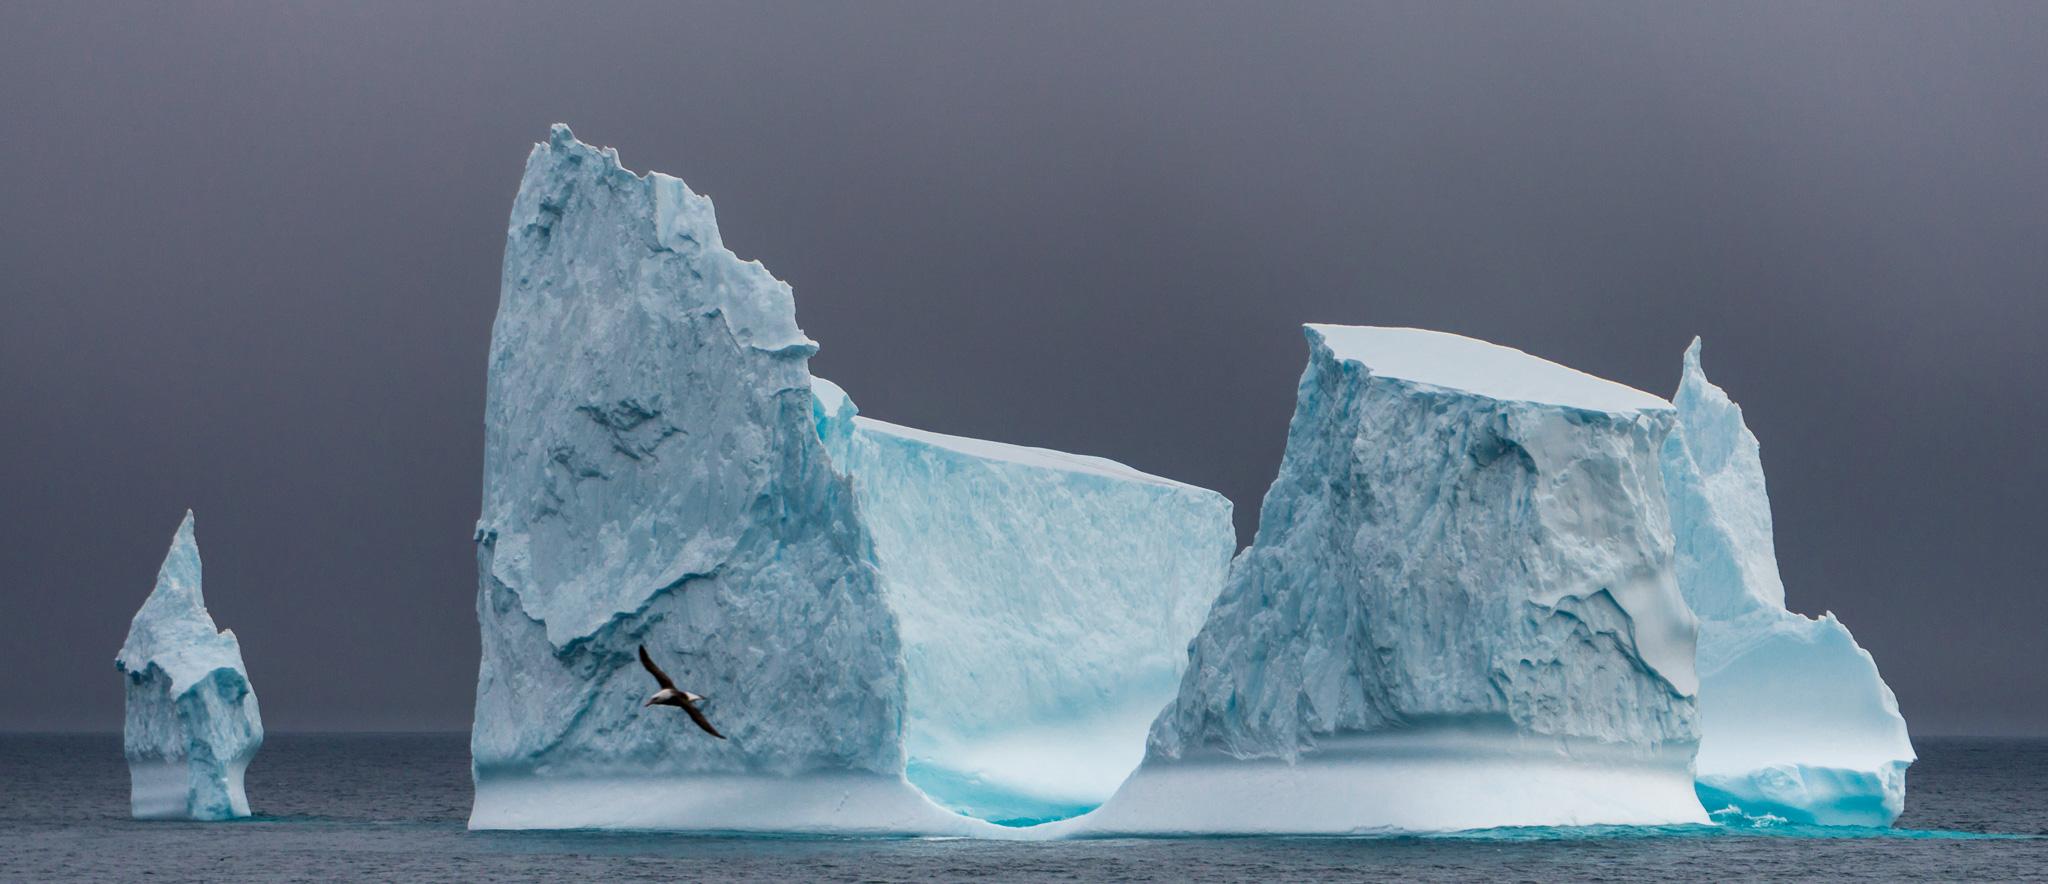 Antarctica Iceberg and Albatross